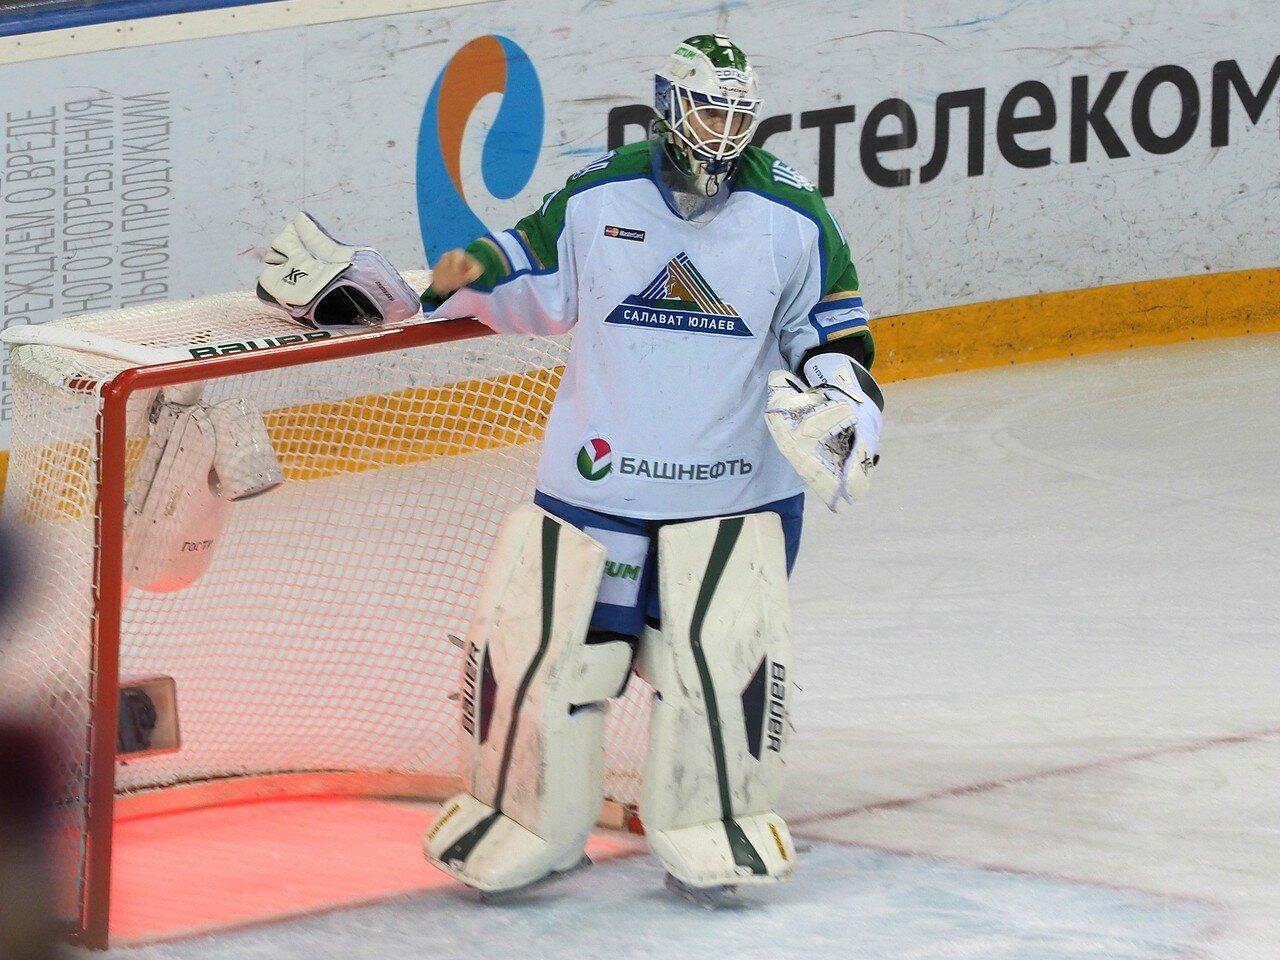 7Плей-офф 2016 Восток Финал Металлург - Салават Юлаев 25.03.2016